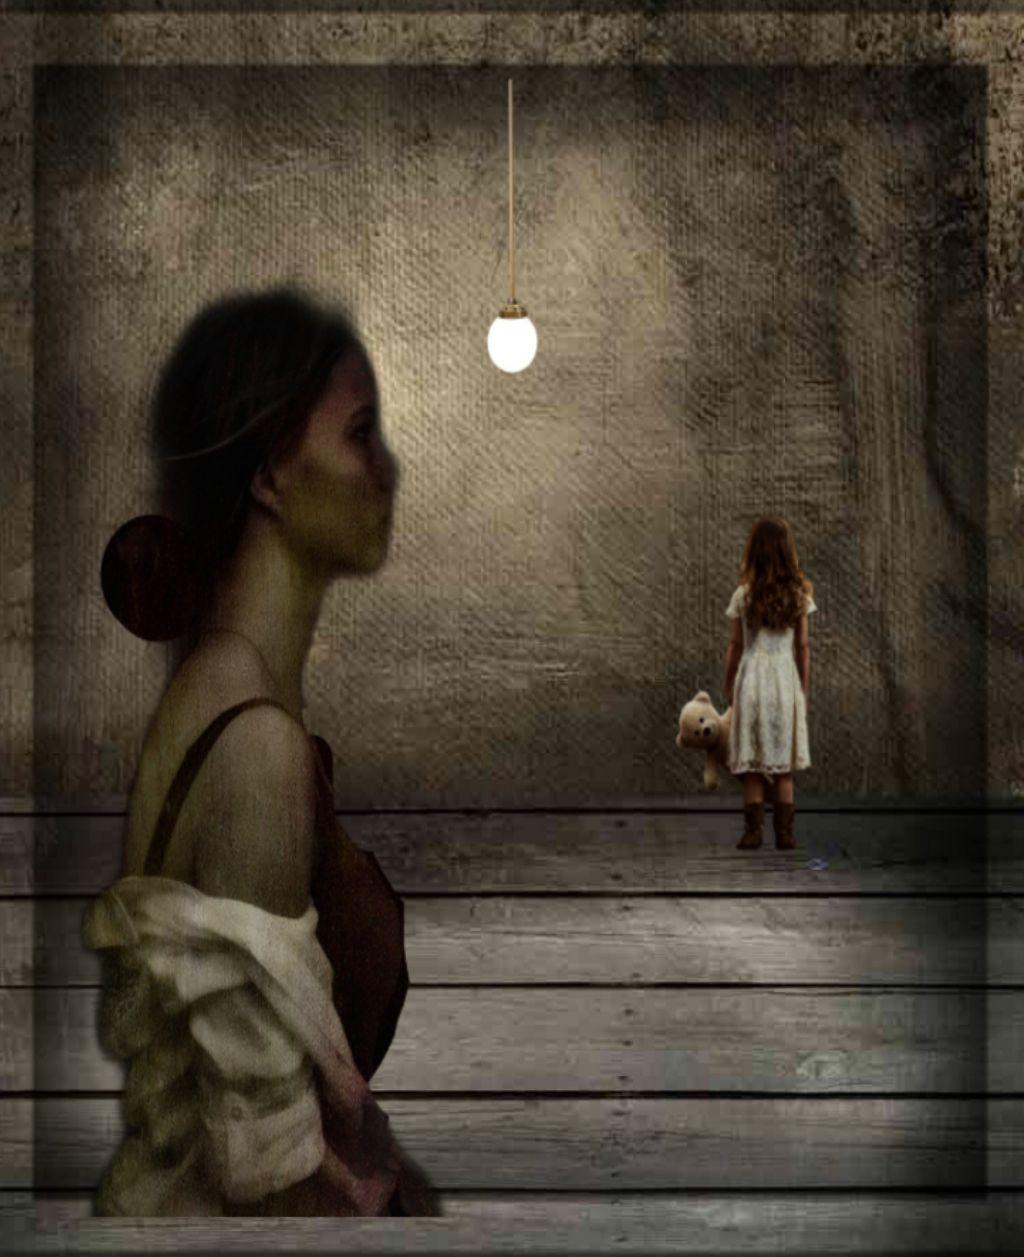 #freetoedit #lady #littlegirl #empty room #hanging light #